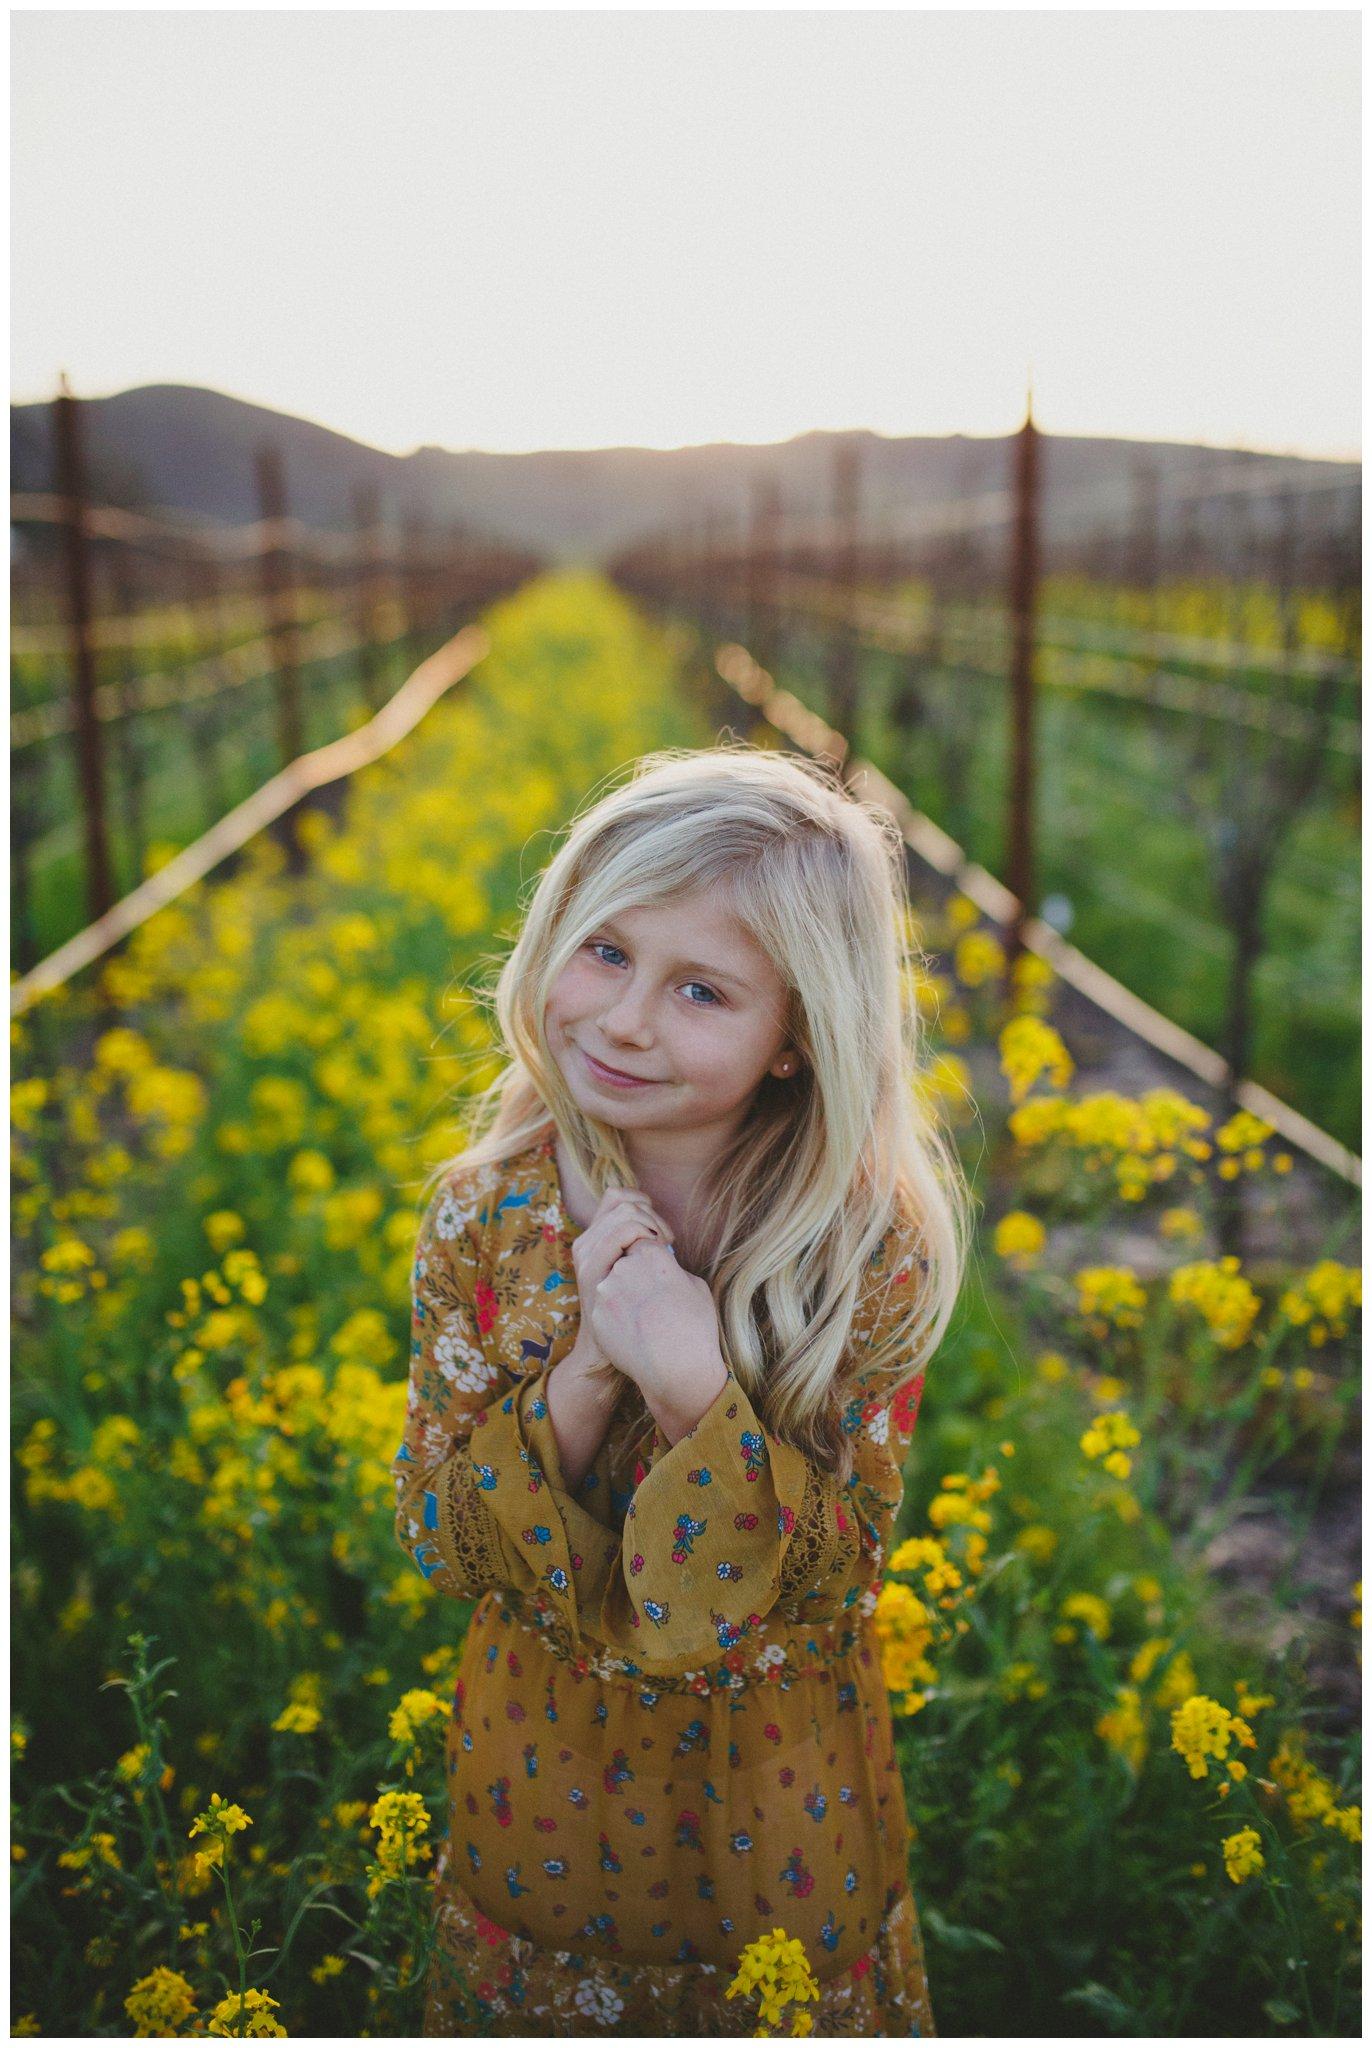 Mustard Seed {Sonoma County Photographer}